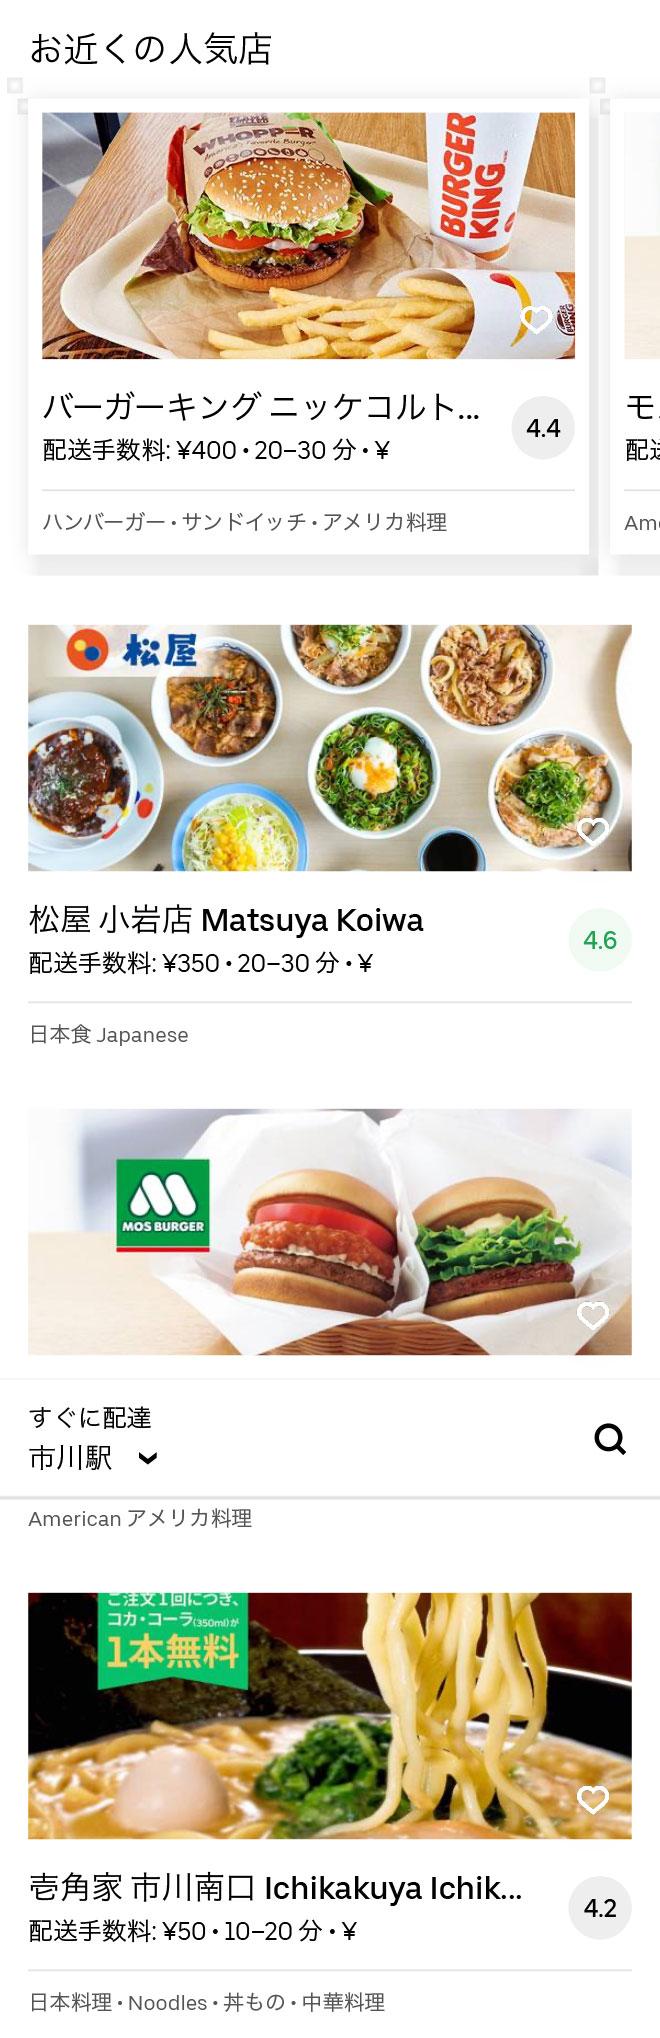 Ichikawa menu 2004 02